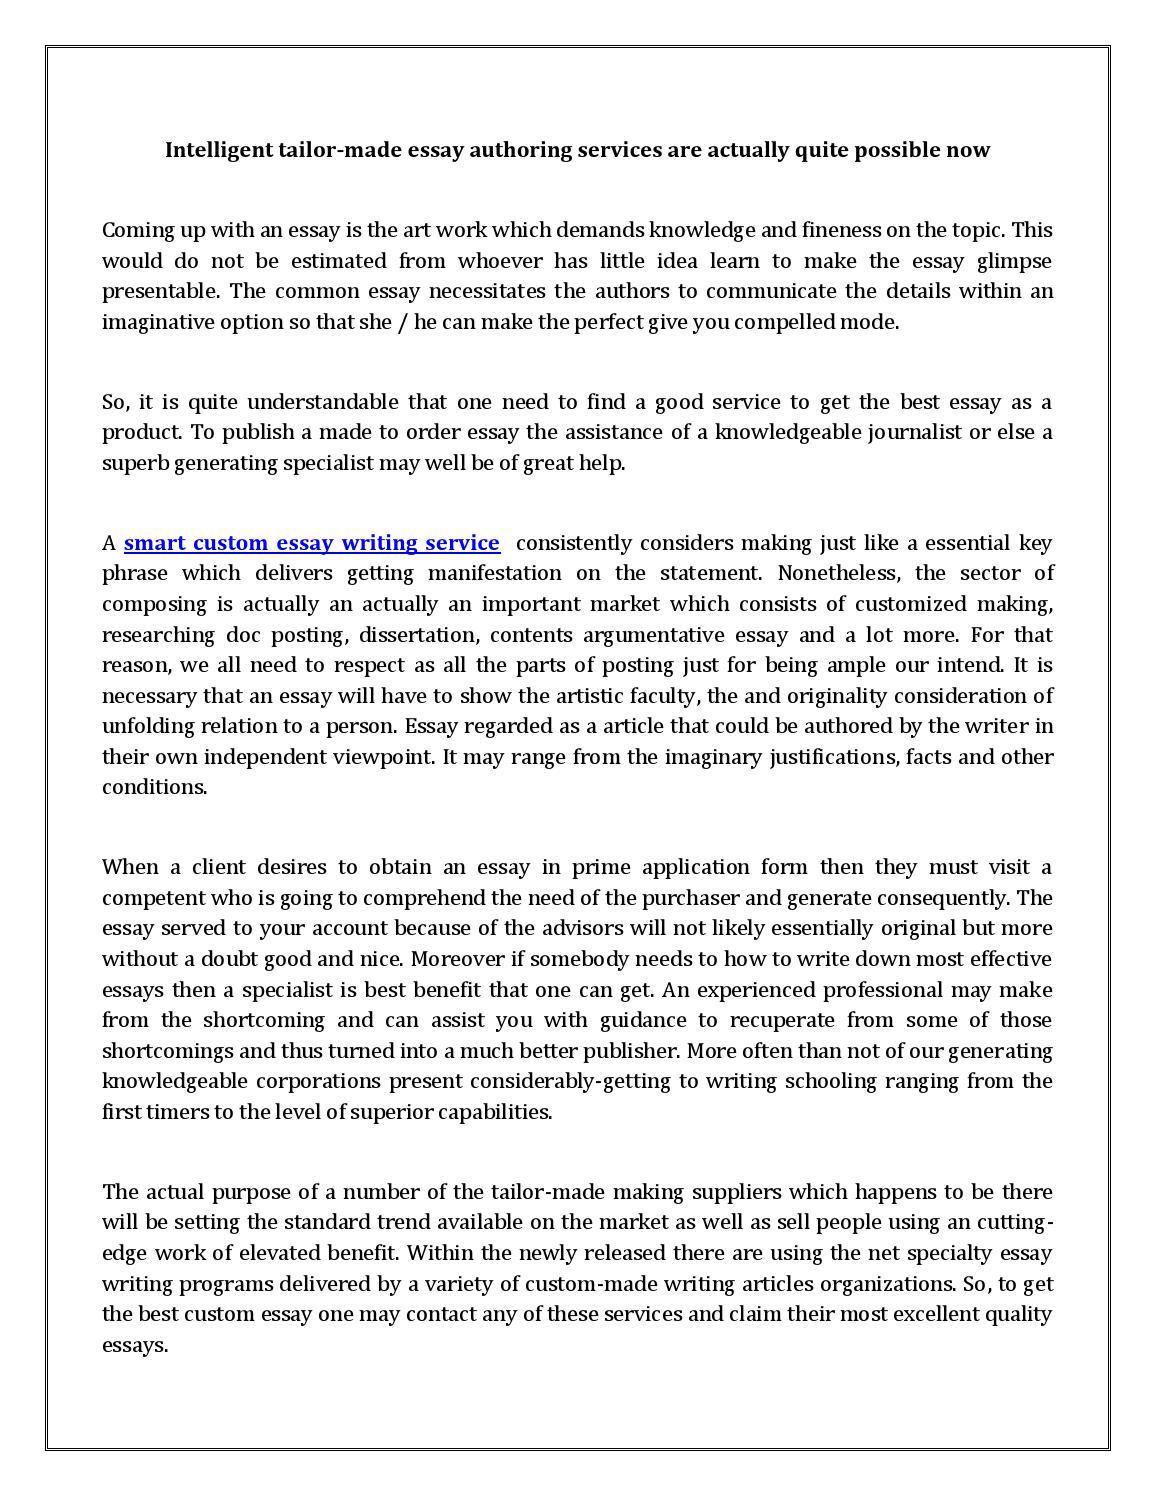 Custom made essay write professional business plan free